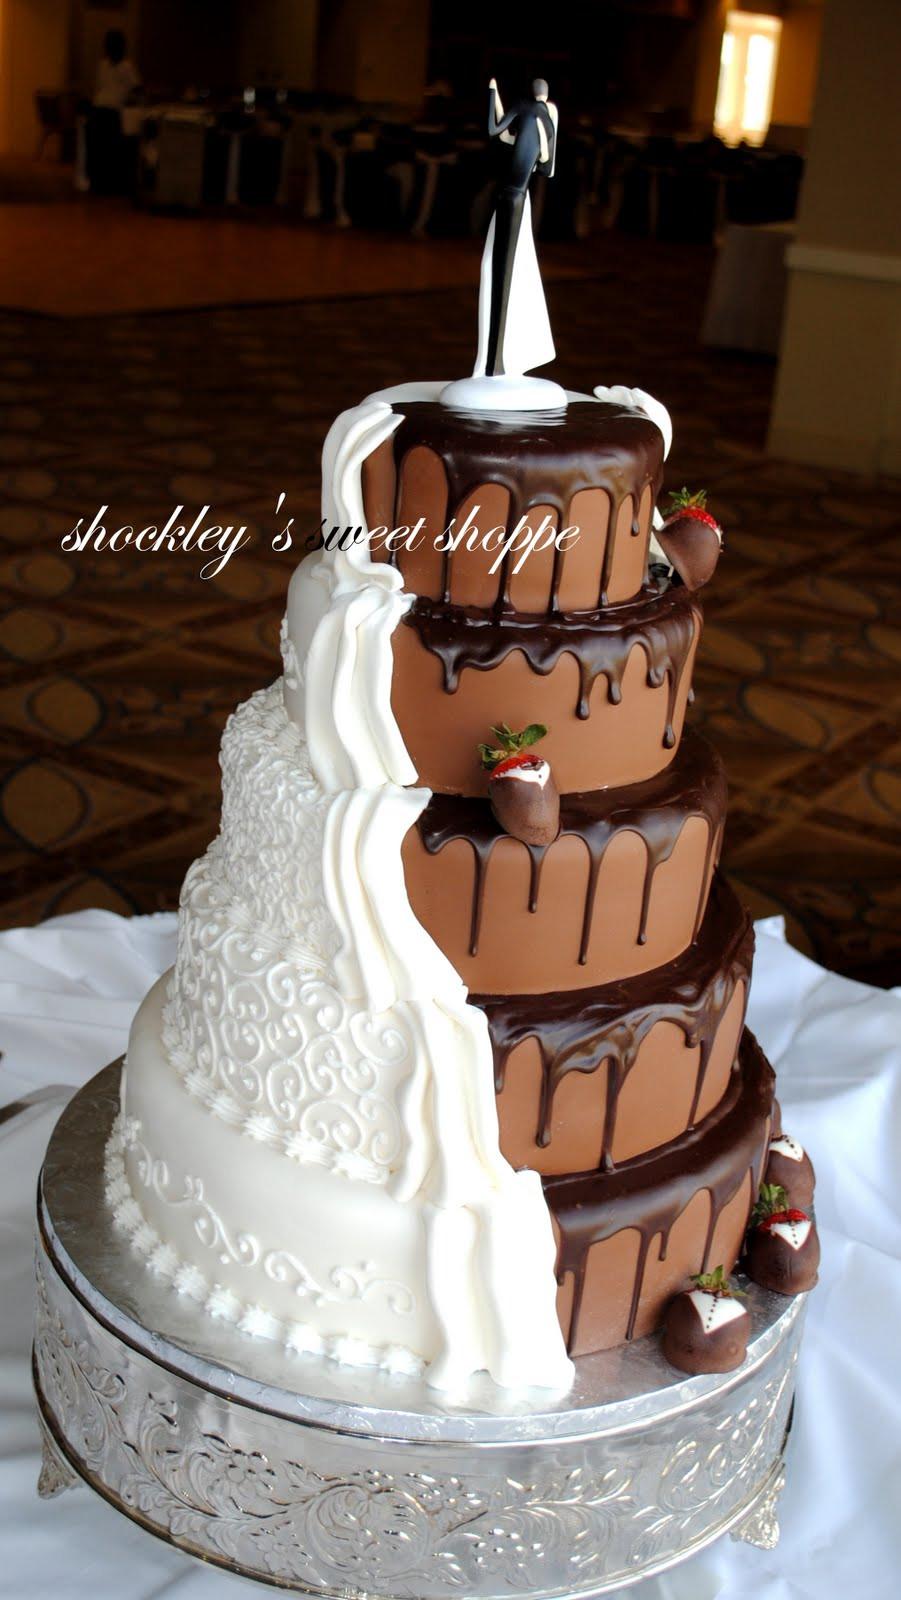 Wedding Cakes Chocolate  Shockley s Sweet Shoppe